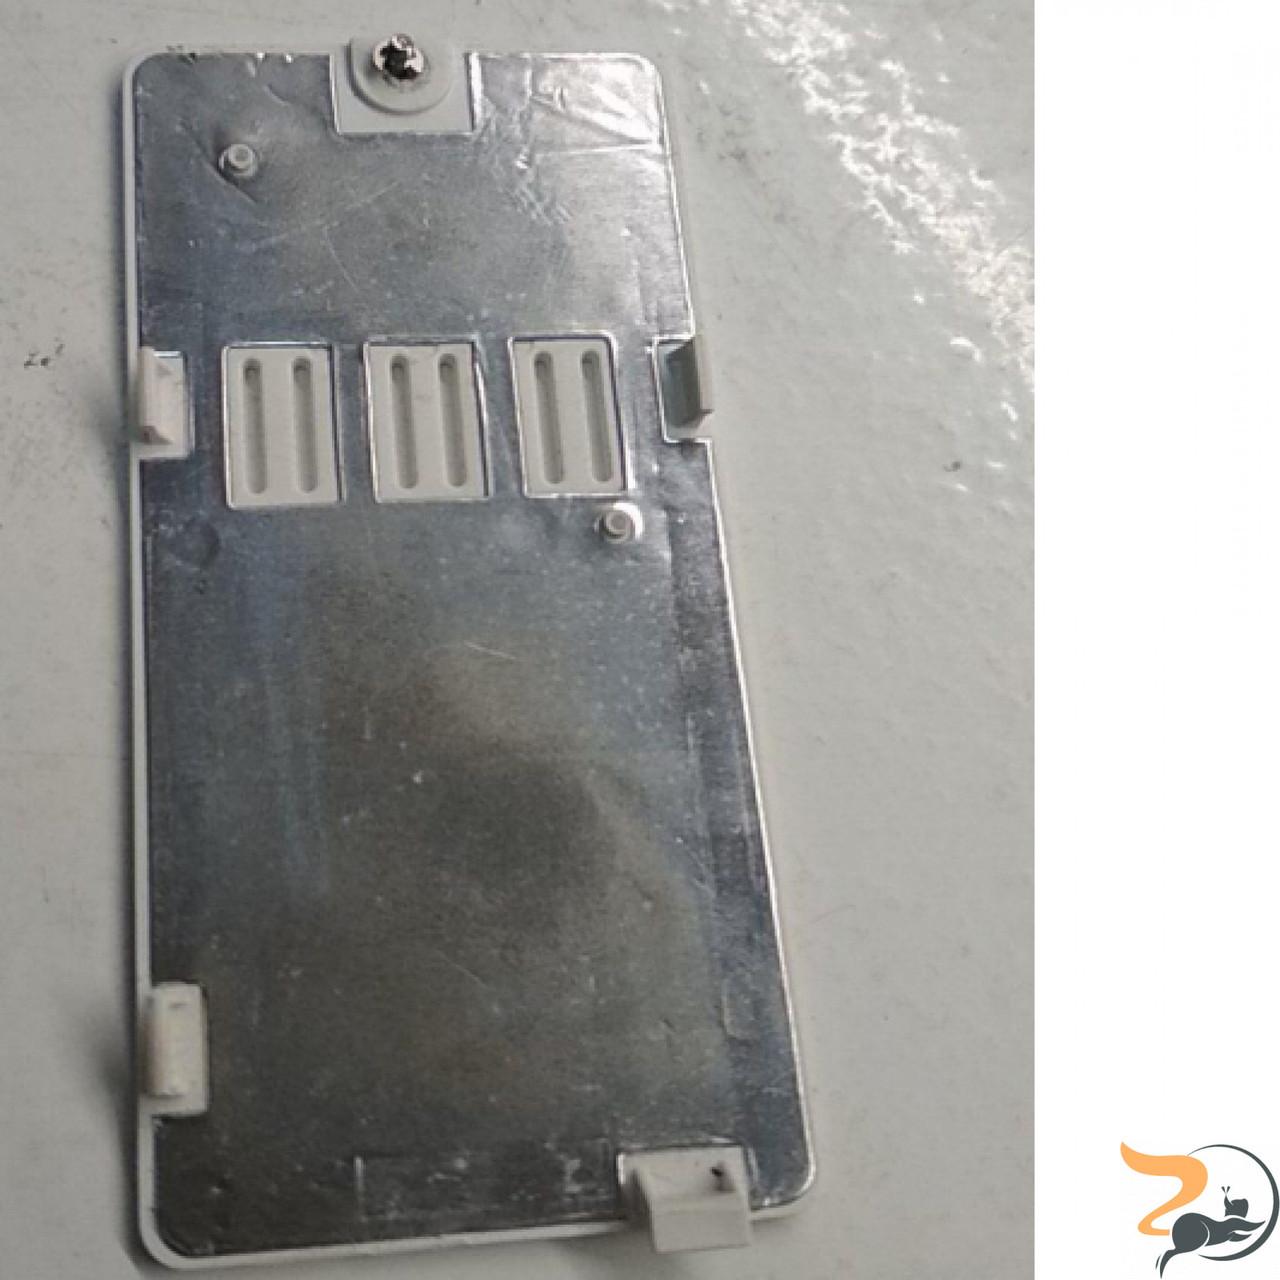 Сервісна кришка для ноутбука Asus Eee PC 1005HA, Б/В